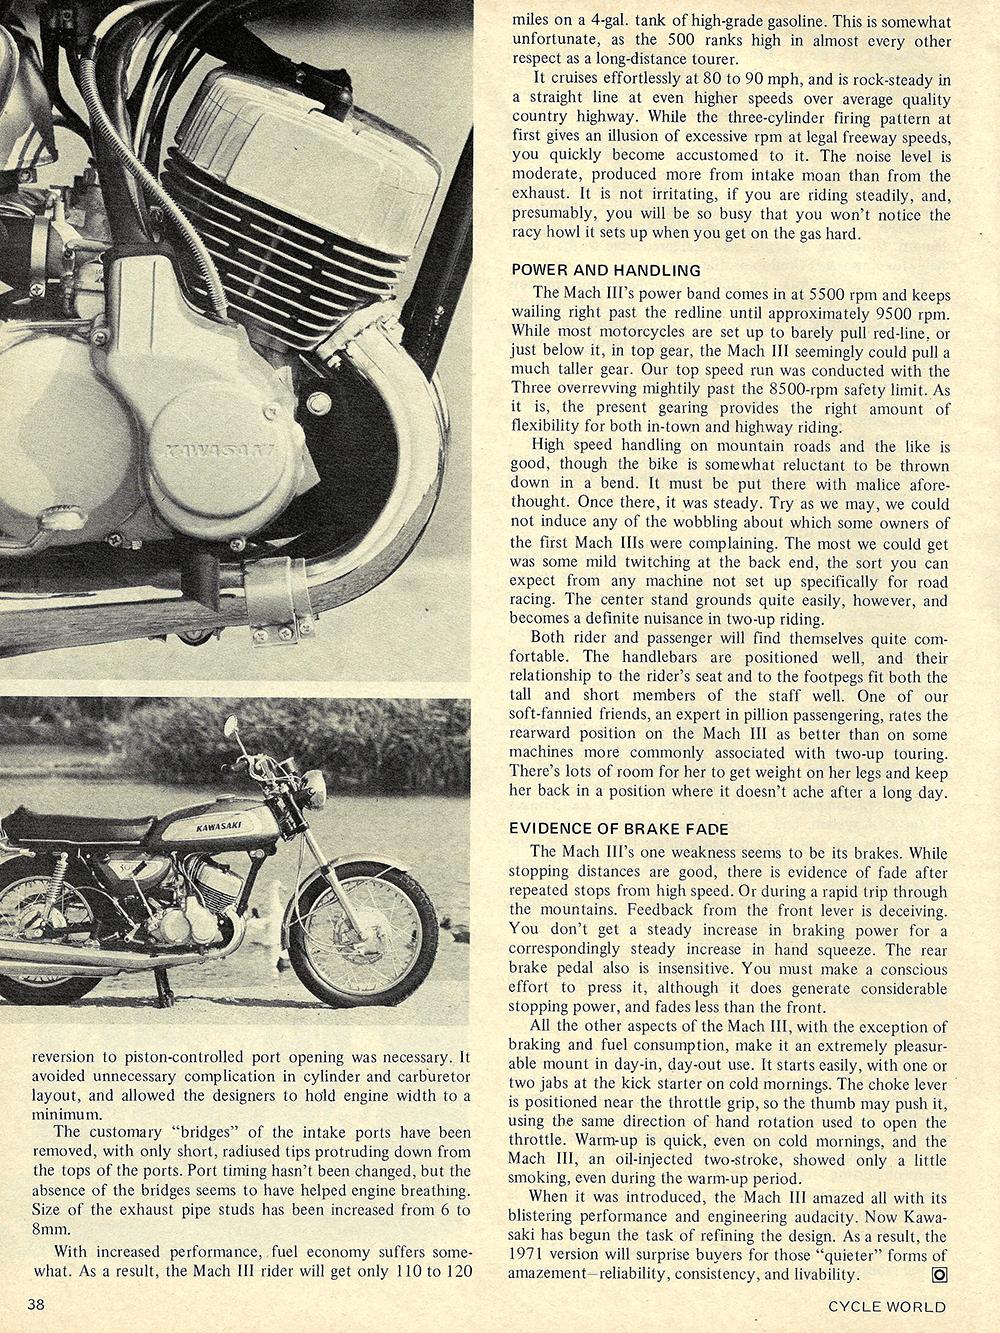 1971 Kawasaki Mach 3 road test 03.jpg